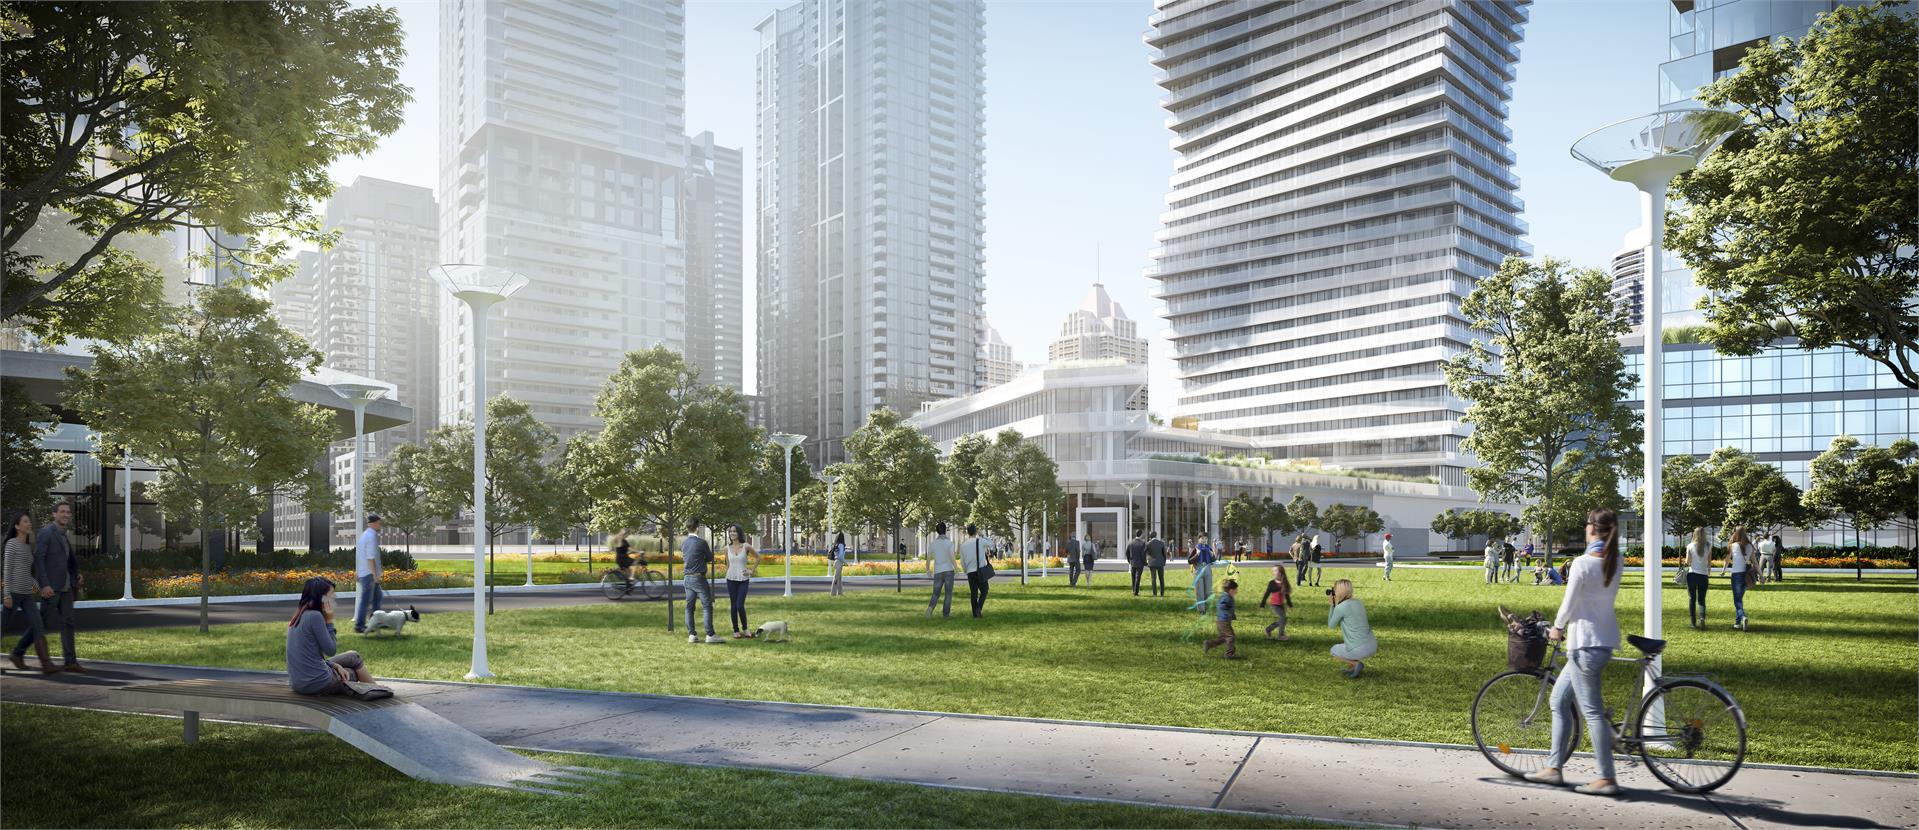 Exterior photo of M City Condos Phase 1